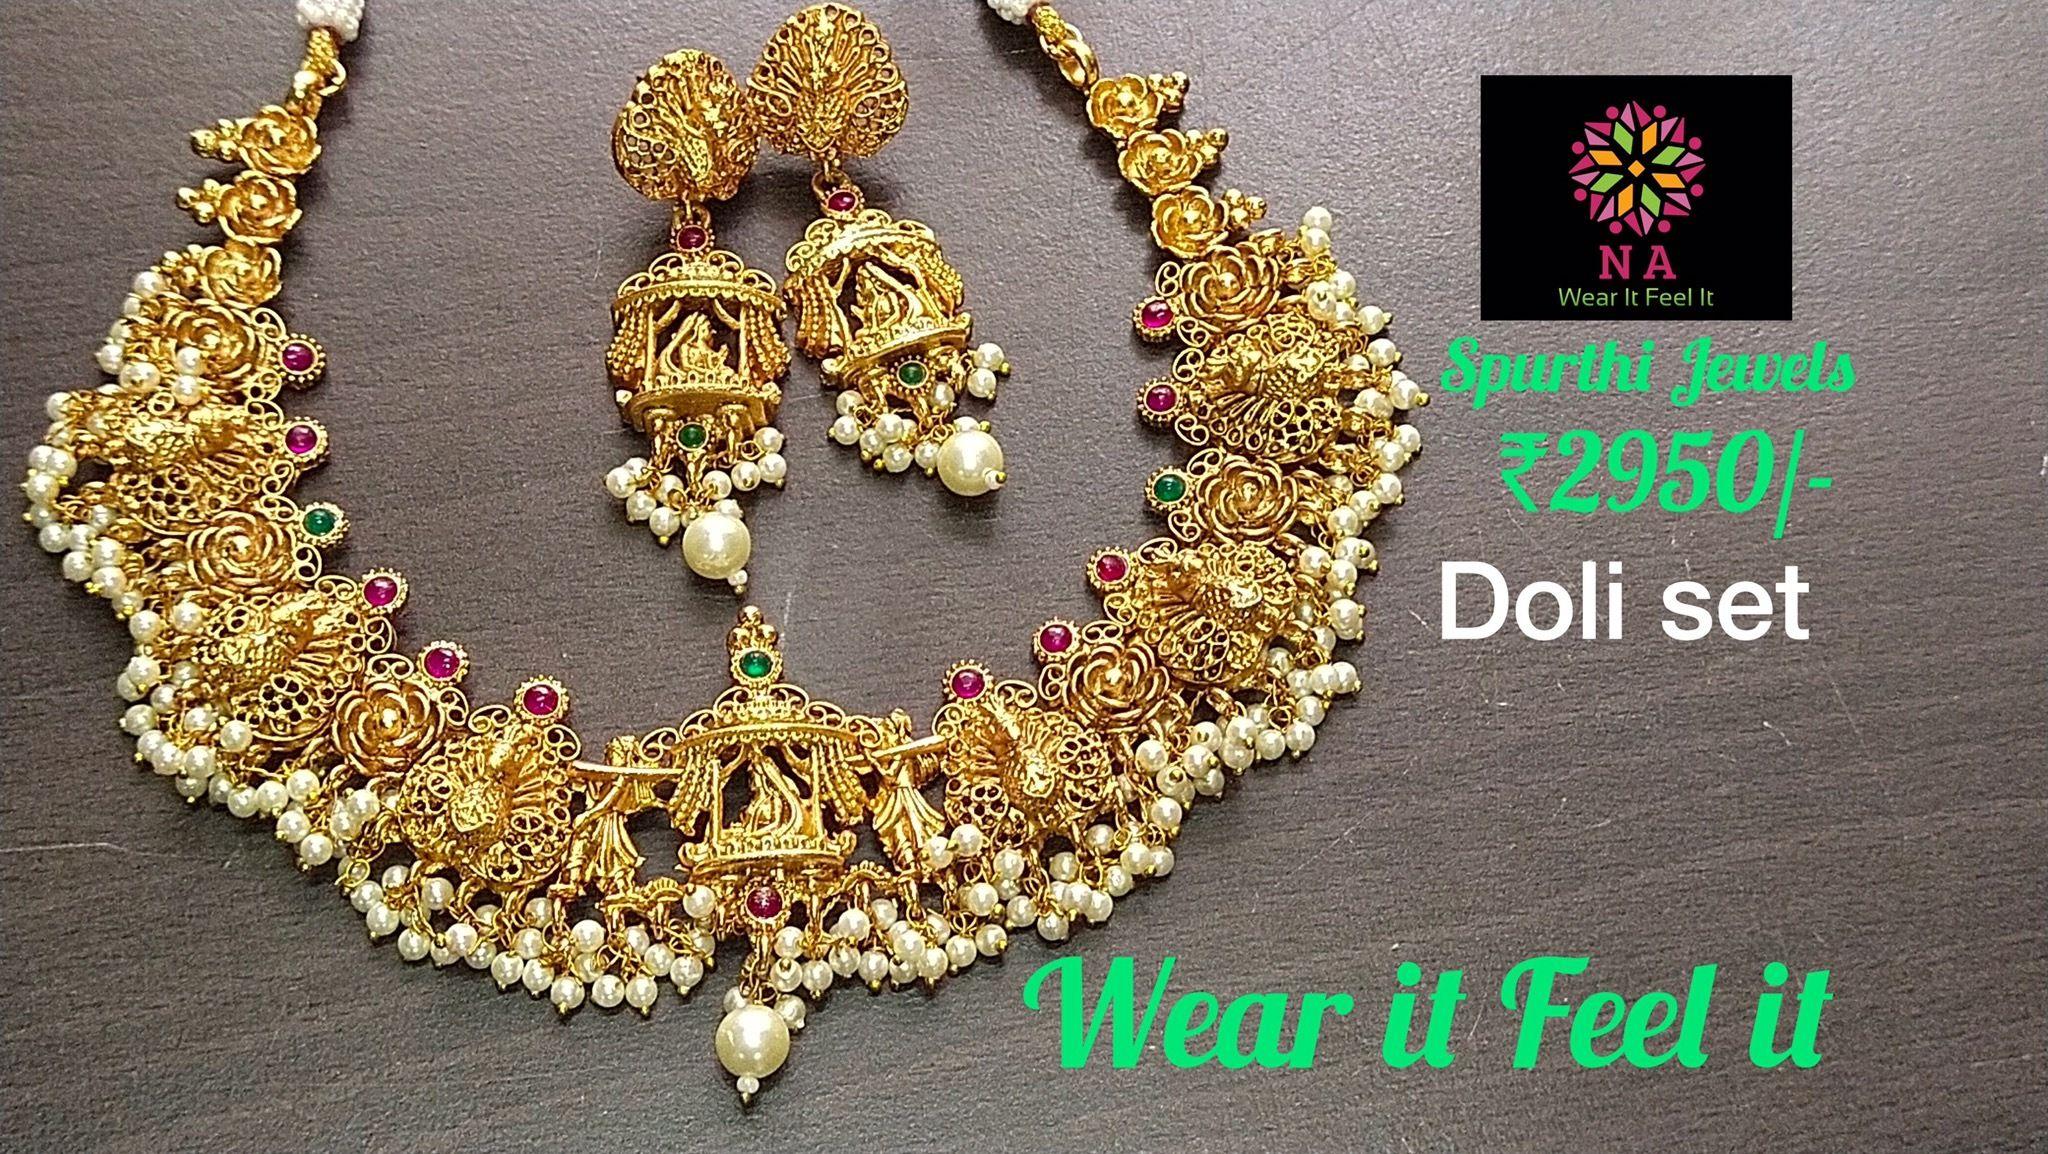 40+ 1 dollar jewelry store online info